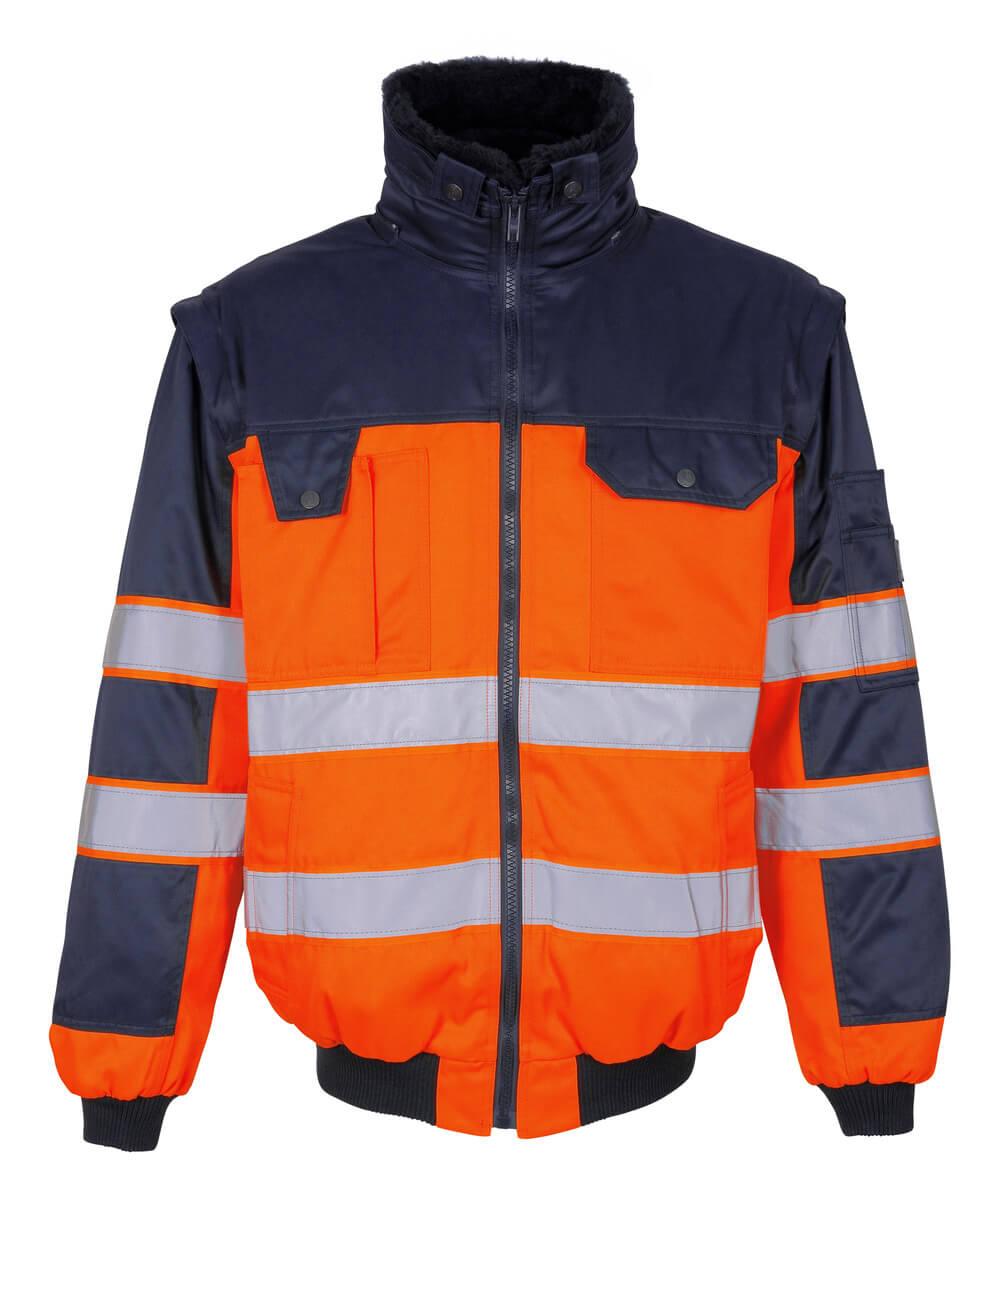 00920-660-141 Pilotjacke - hi-vis Orange/Marine